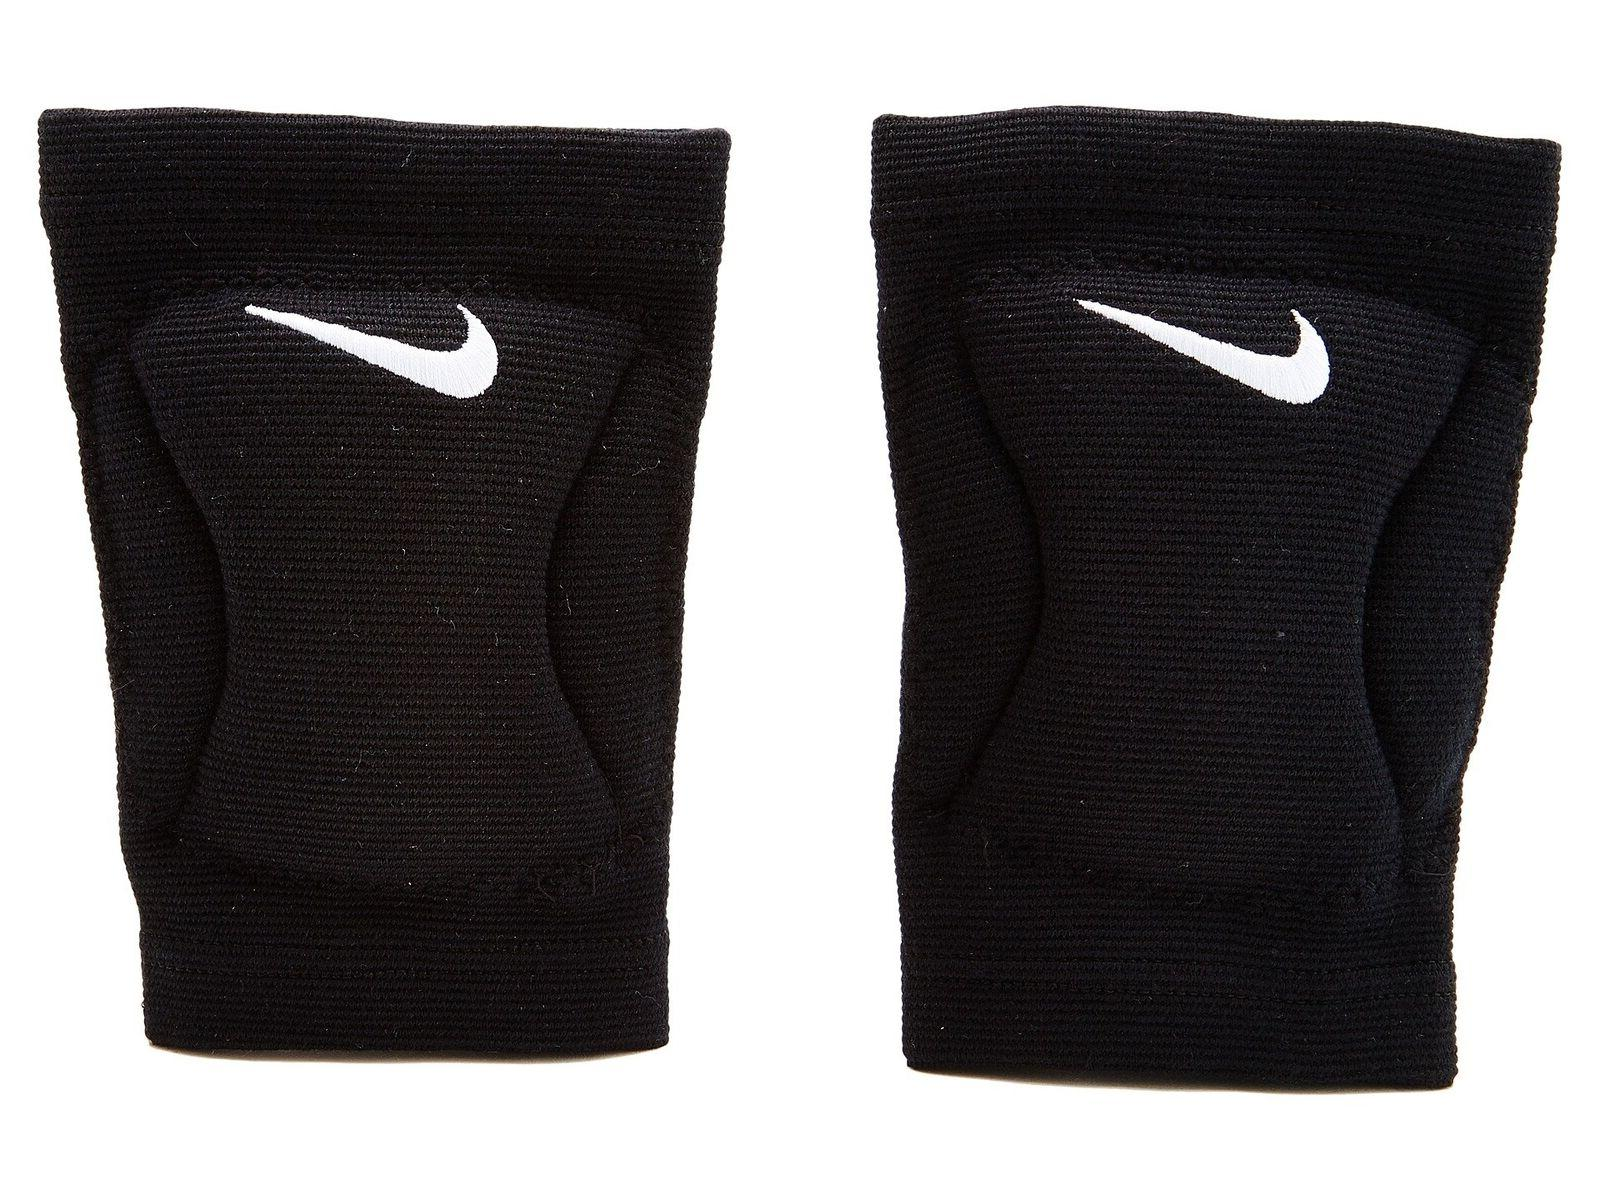 streak volleyball knee pad